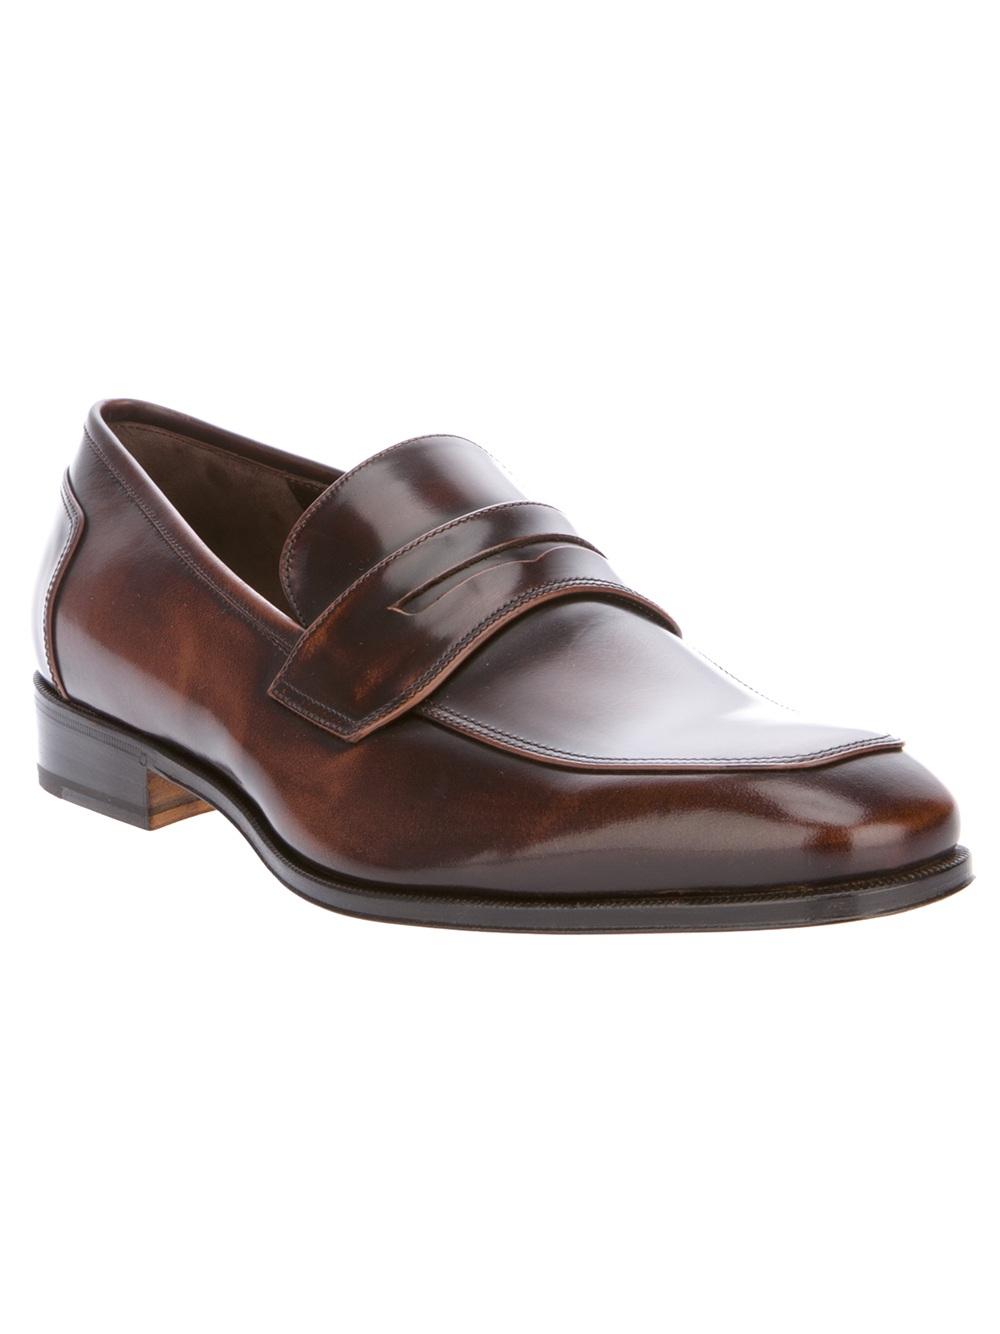 Salvatore Ferragamo Lana Buckle Leather Loafers N1kCgrlvR